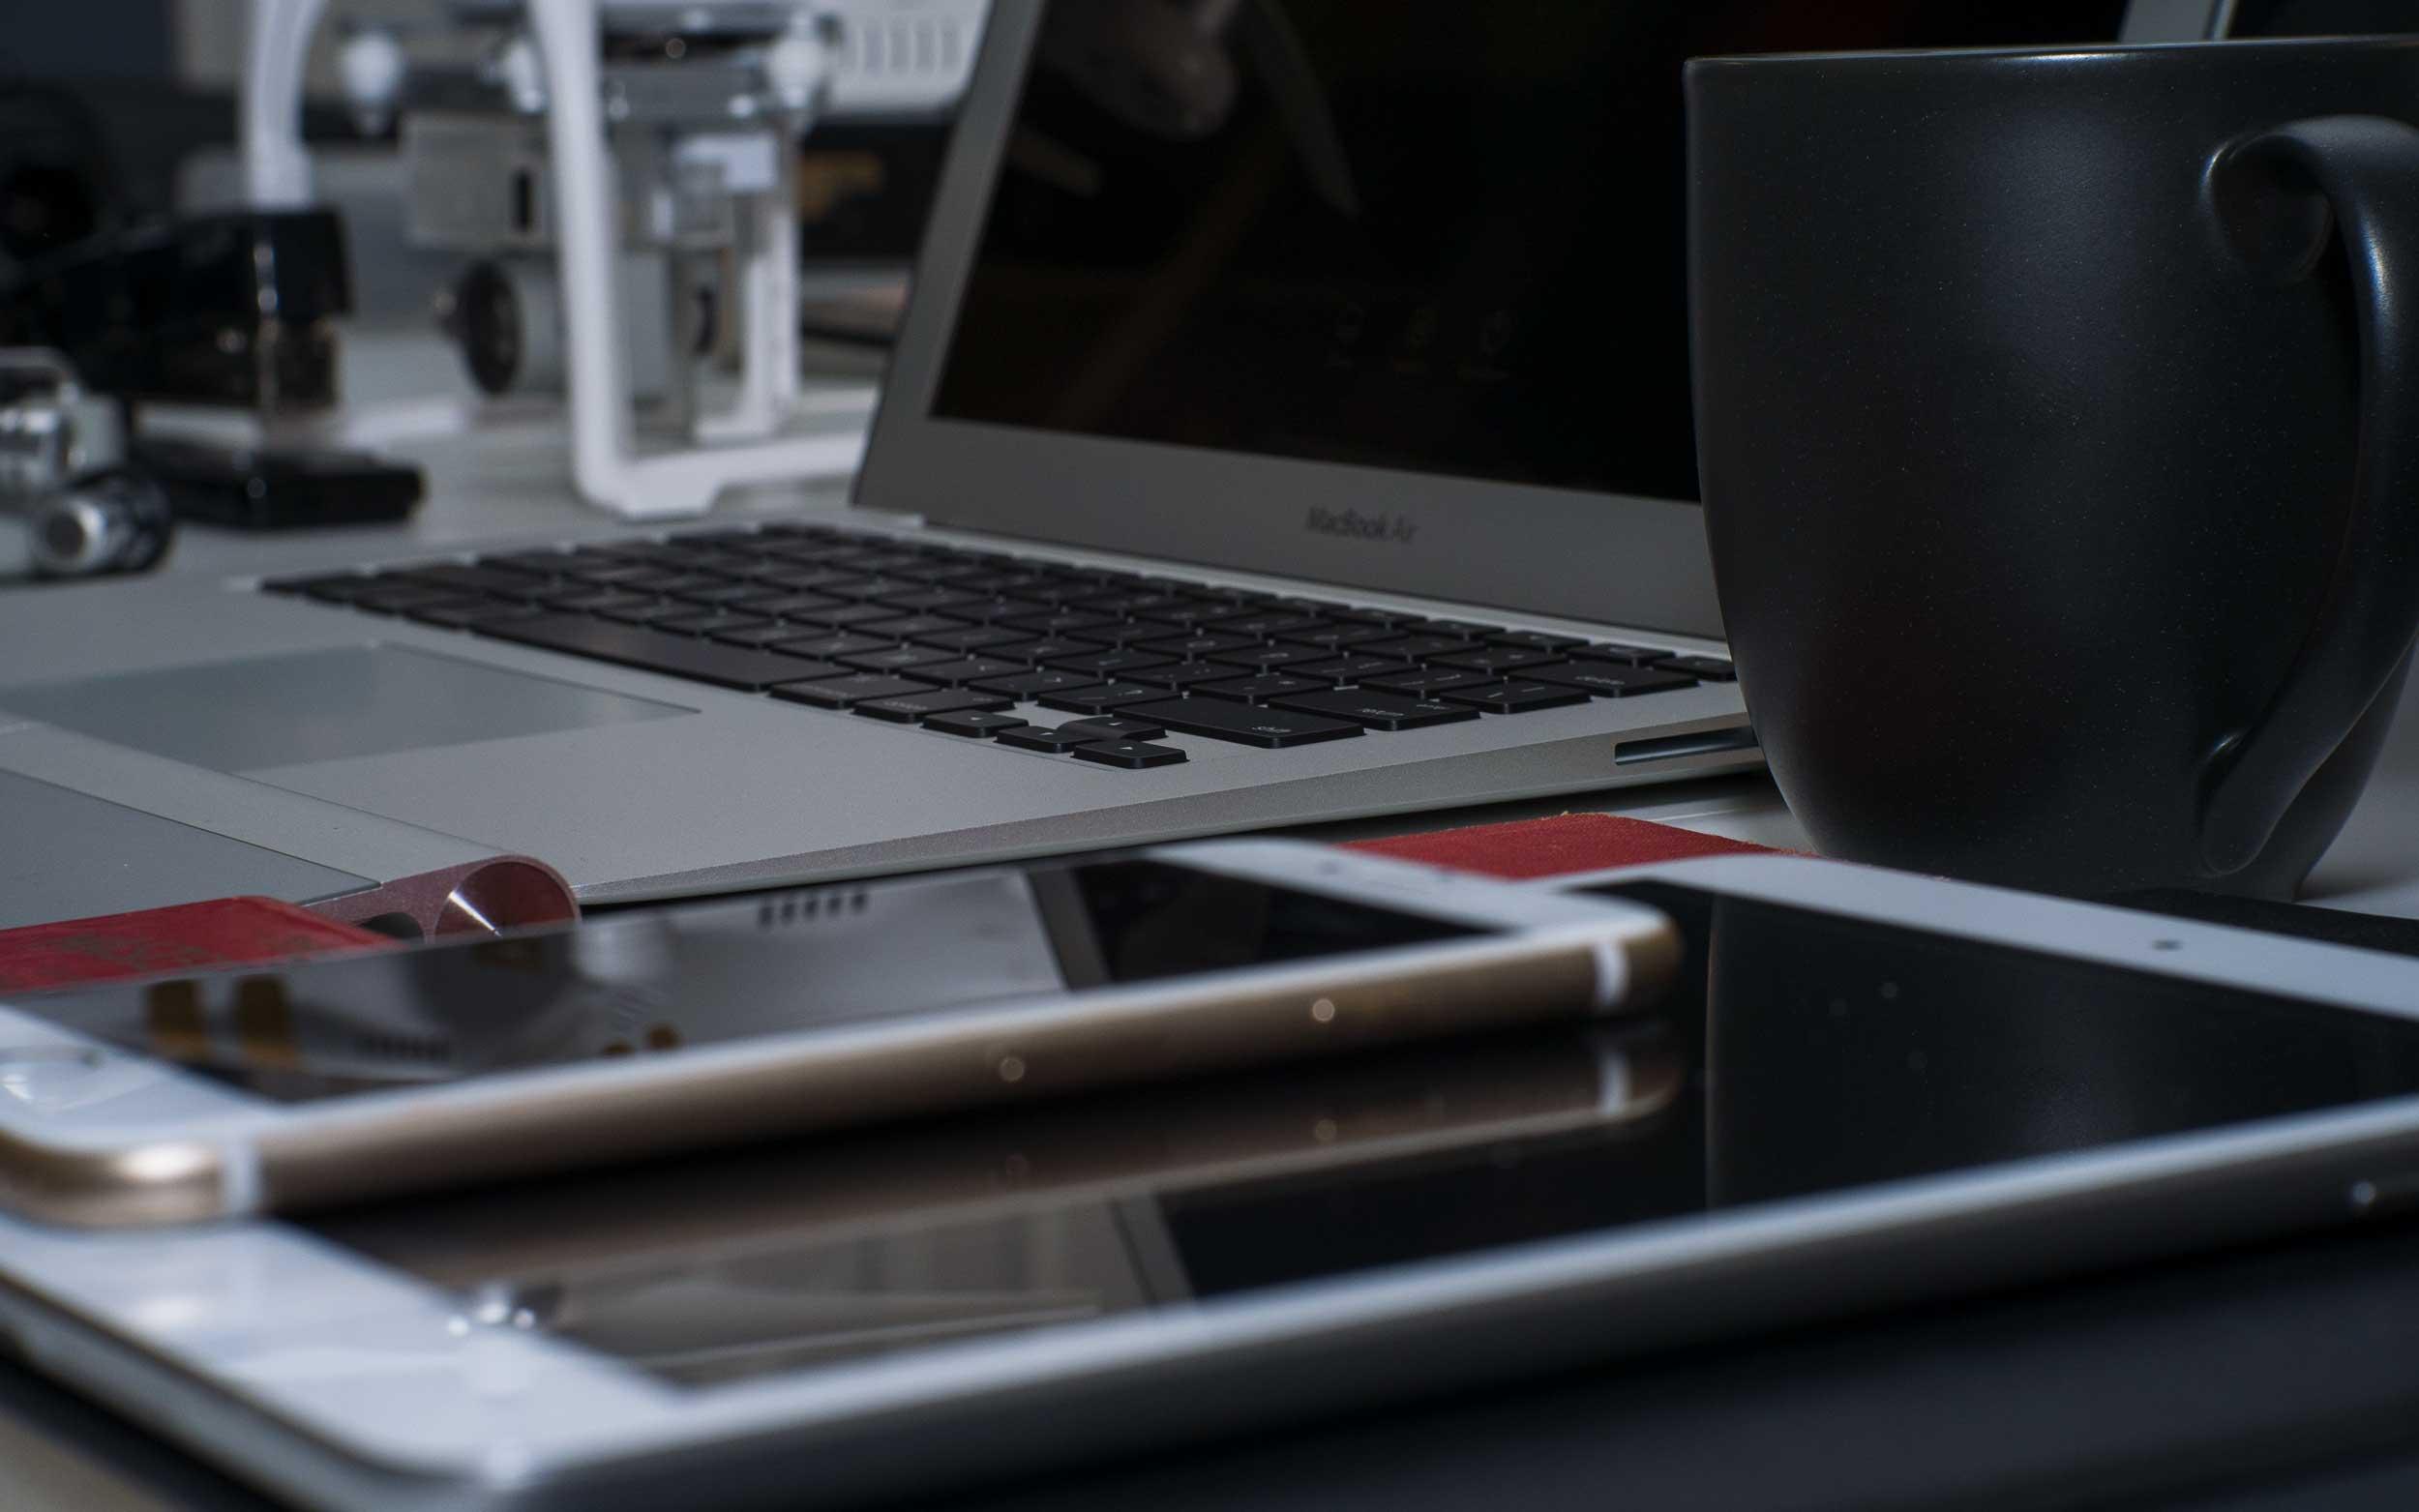 macbook-desk-shot-dark.jpg